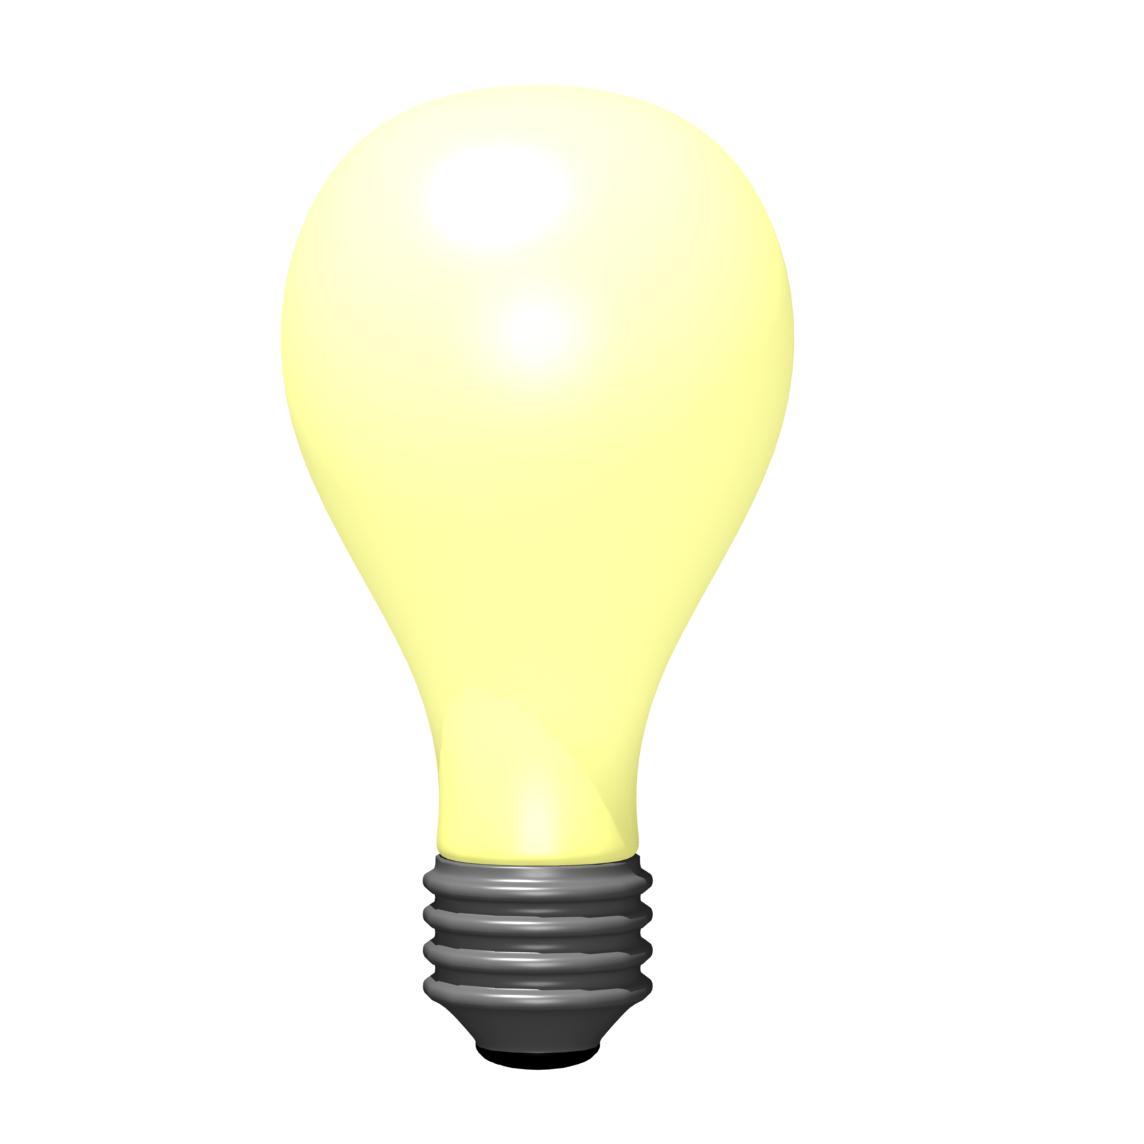 Bulb PNG Image